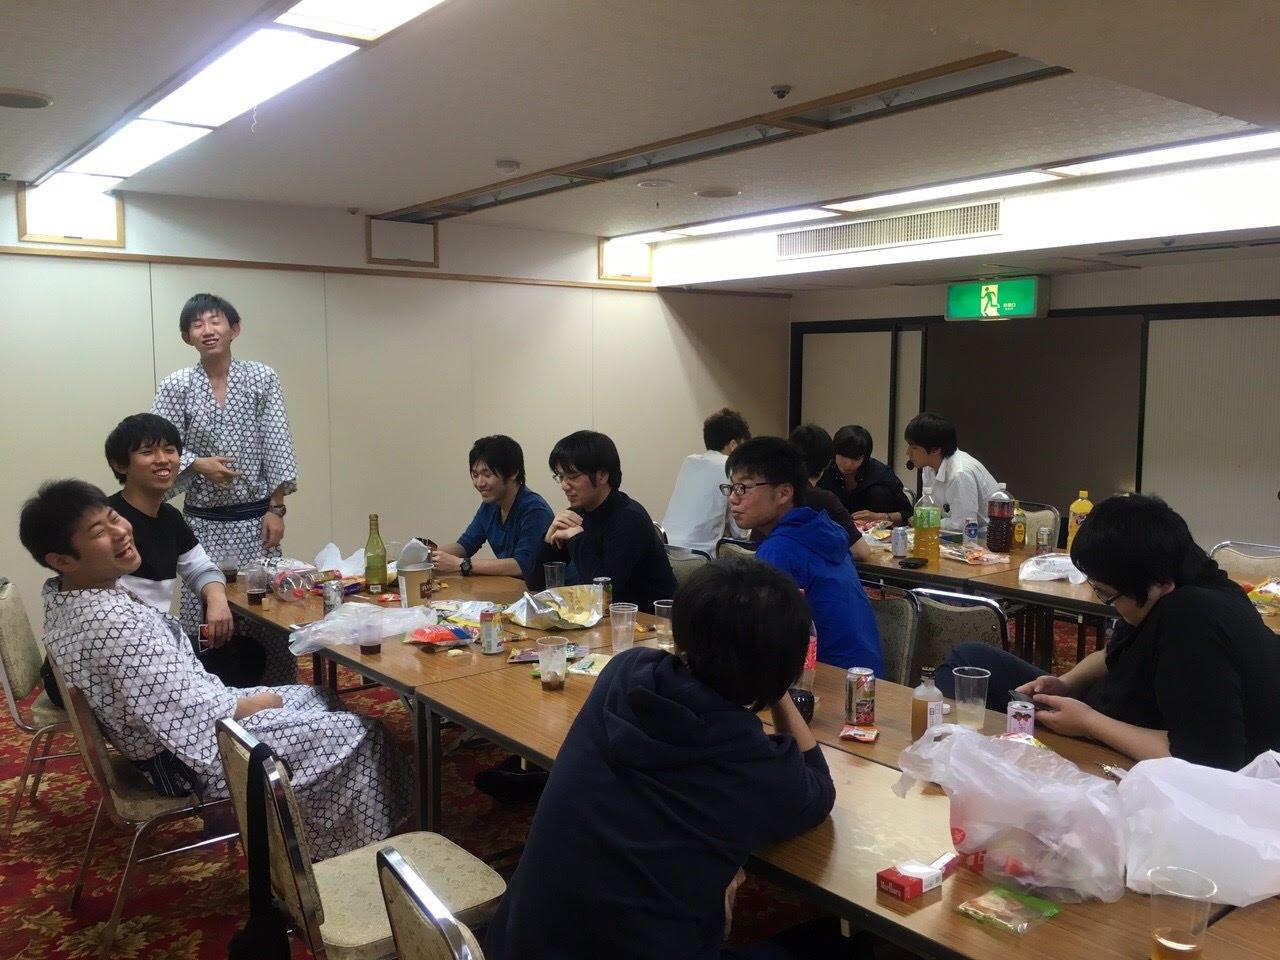 https://4310b1a9-a-c2f1267d-s-sites.googlegroups.com/a/yoshida-agu.net/home/dairy-of-yoshida-lab/20151178/nomi2.JPG?attachauth=ANoY7cobfS6n-8Pa0ptfMkq5Y7_KHWJ2M6oRp_ZqV0-ljggav-FRXk5-lluT38DcnfUfsjZi1nQDEf8HohoAIfoyHxGpGUQuL2czXr3Z3f2dKL2bXWuZPwIBo5uwkWRilH9RyfsmxXkQXP3xzhYjoUdm-ZGo4odYAlLuDjTq5FqtxOoBnH8Z2-nAWw7T8k9Ev0xVGZqpzqQIQ0kuZxbLM4qzgn8NZK6eRsYlHz9VlWx6_ZL5zzHWsokOP_8BTmWTNJpugTm6sKjA&attredirects=0